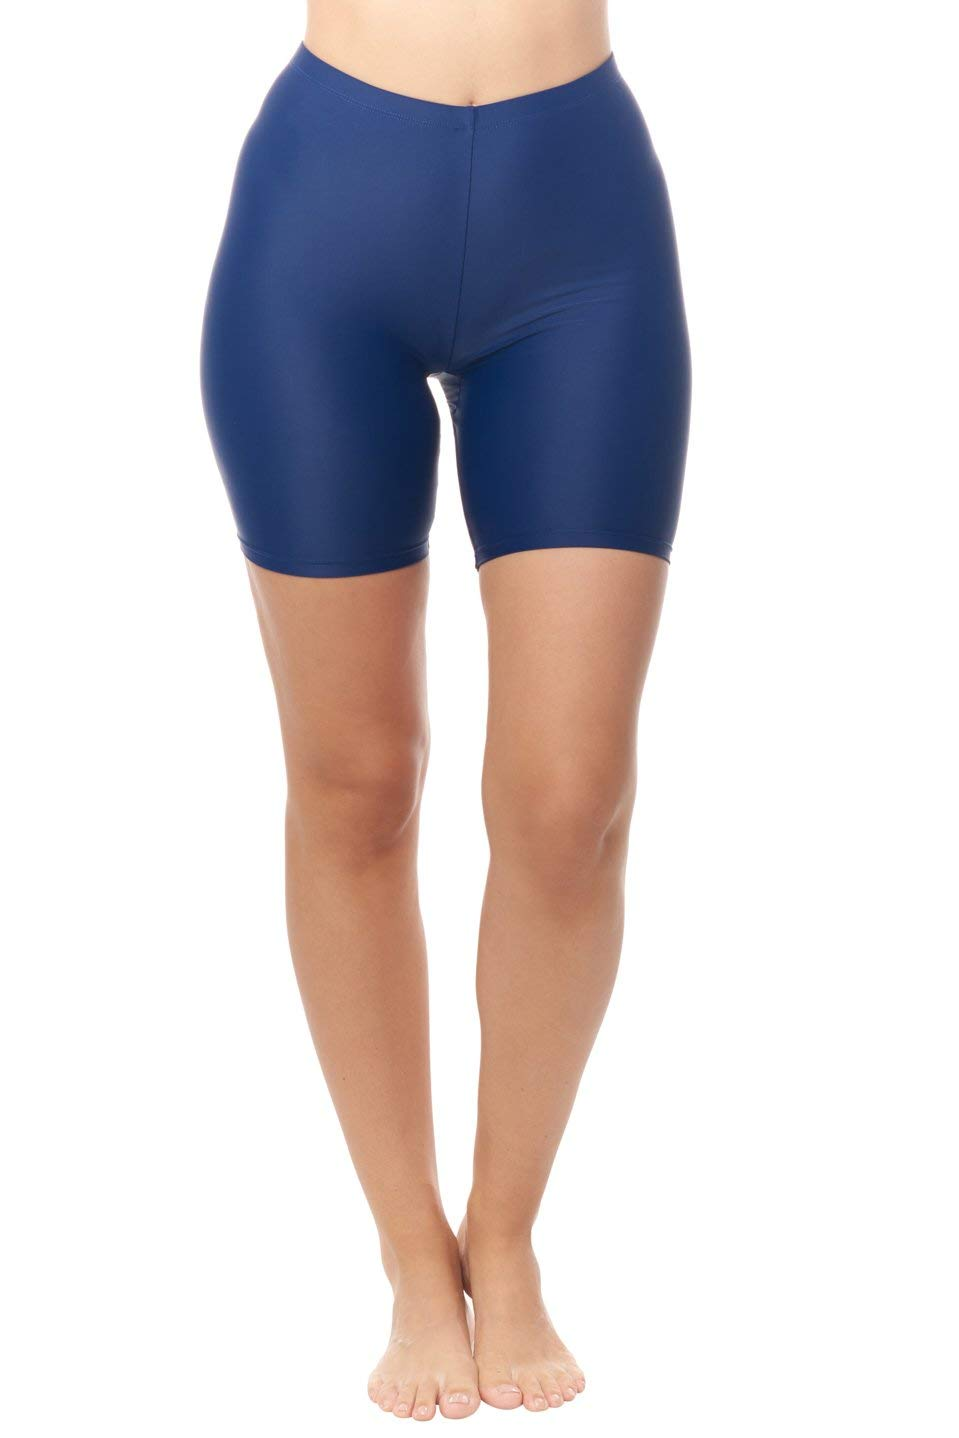 Love My Curves Bike Short Swim Bottom | Quick Dry Shapewear Bathing Suit